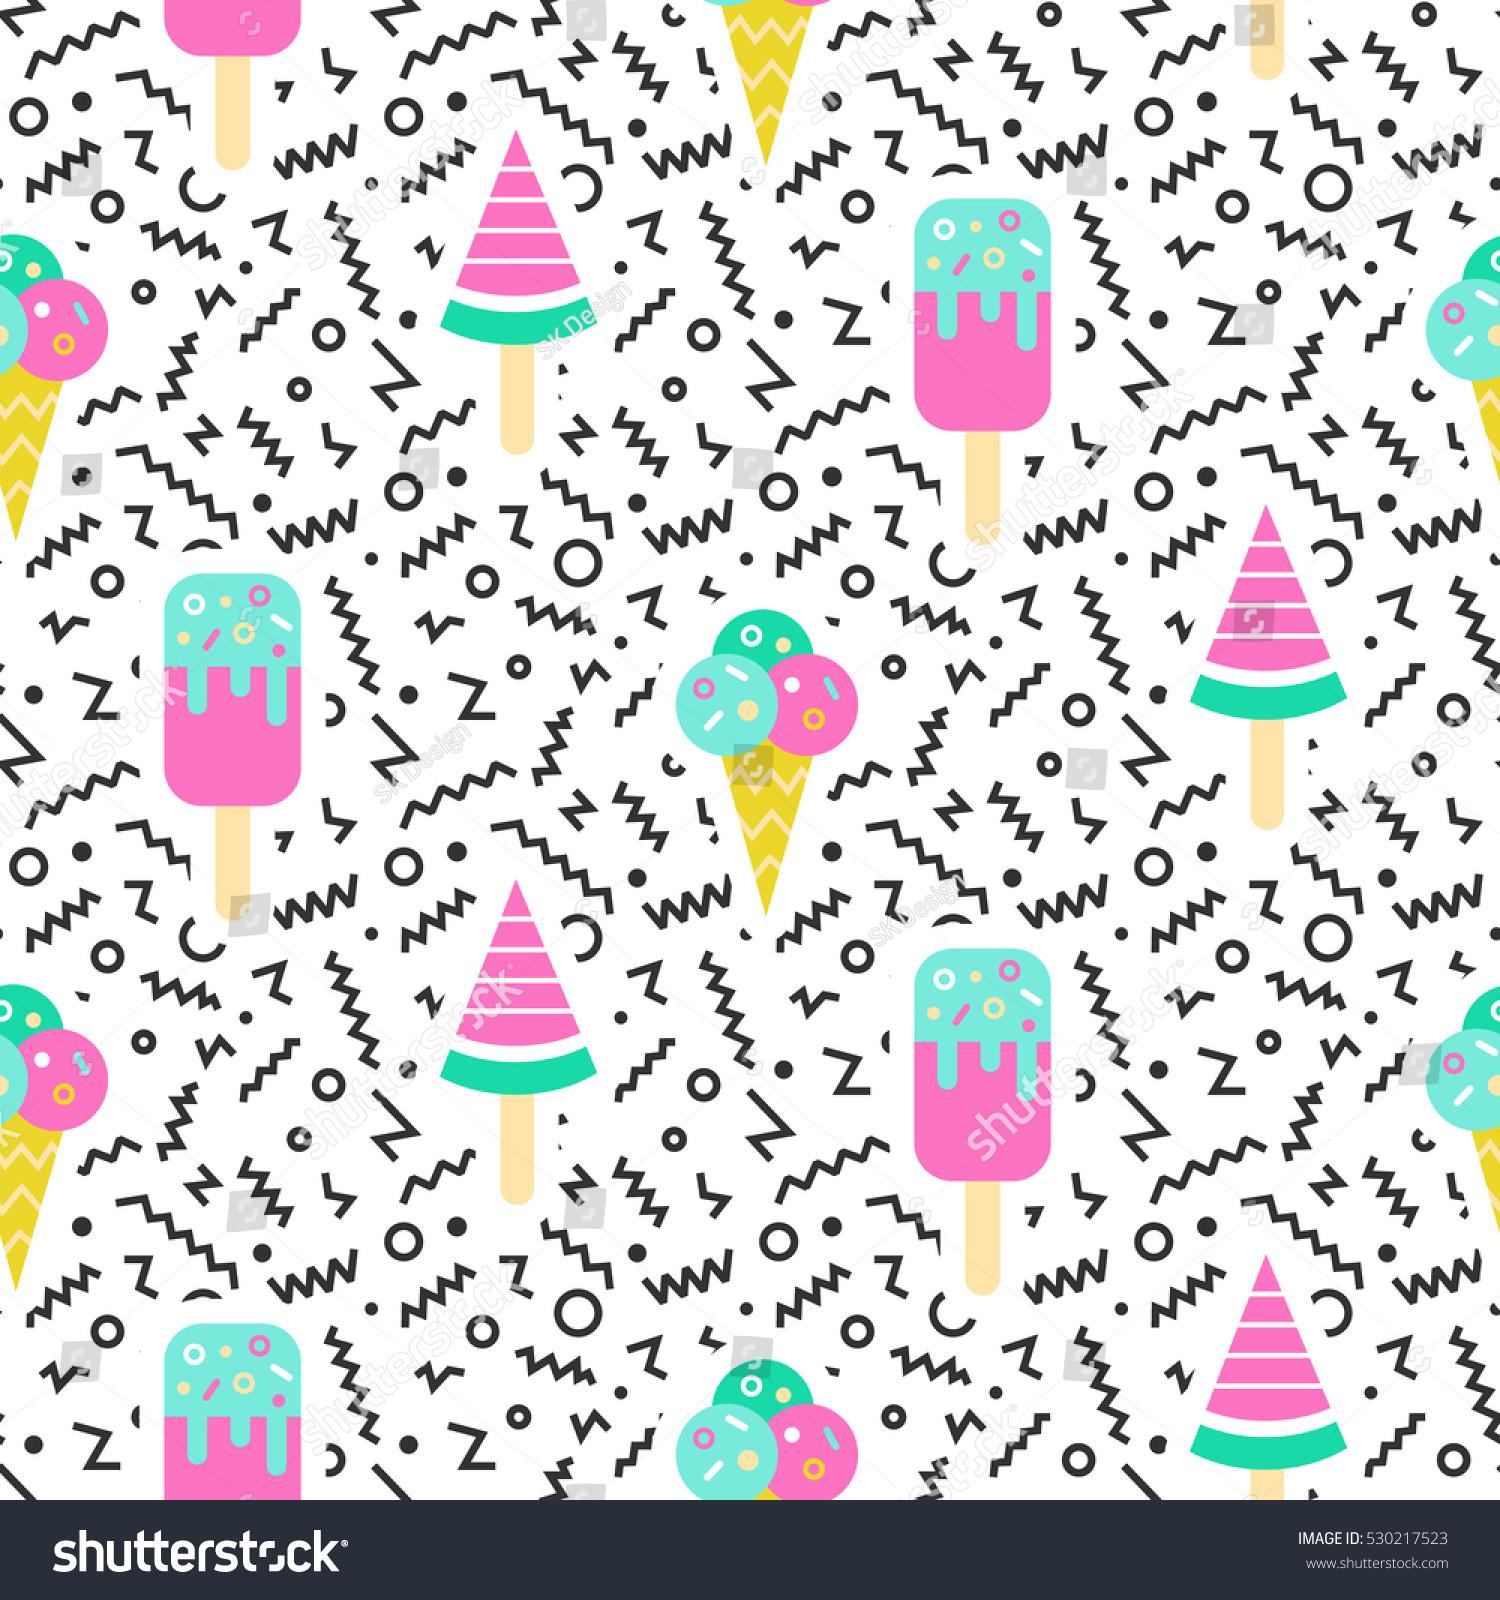 Seamless Ice Cream Background Vintage Style: Ice Cream Geometric Seamless Pattern 80s Stock Vector